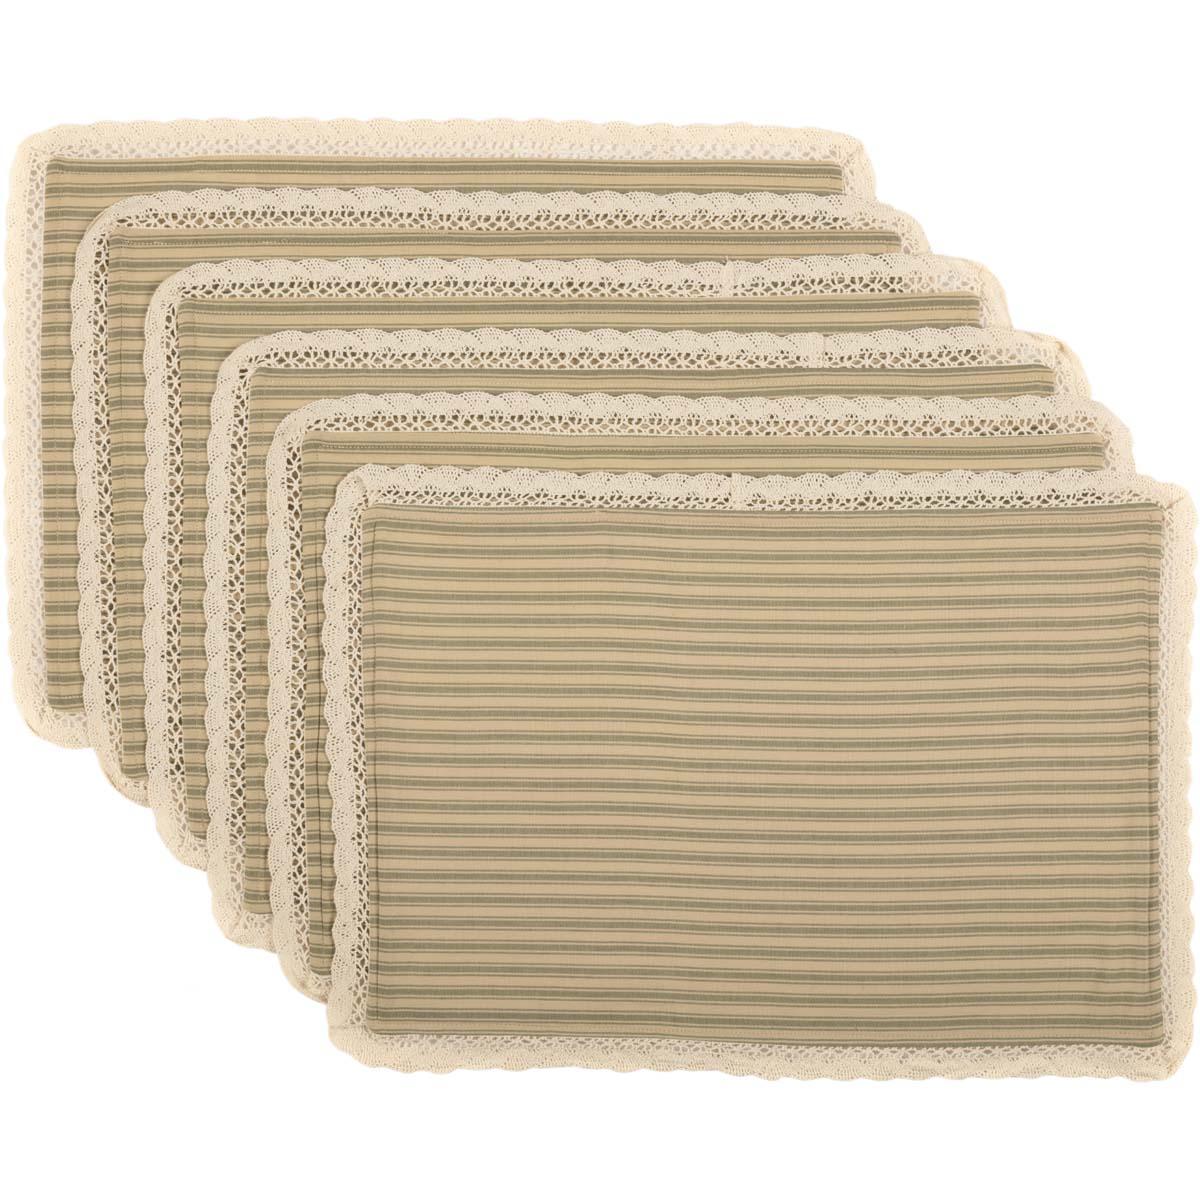 Kendra Stripe Green Placemat Set of 6 12x18